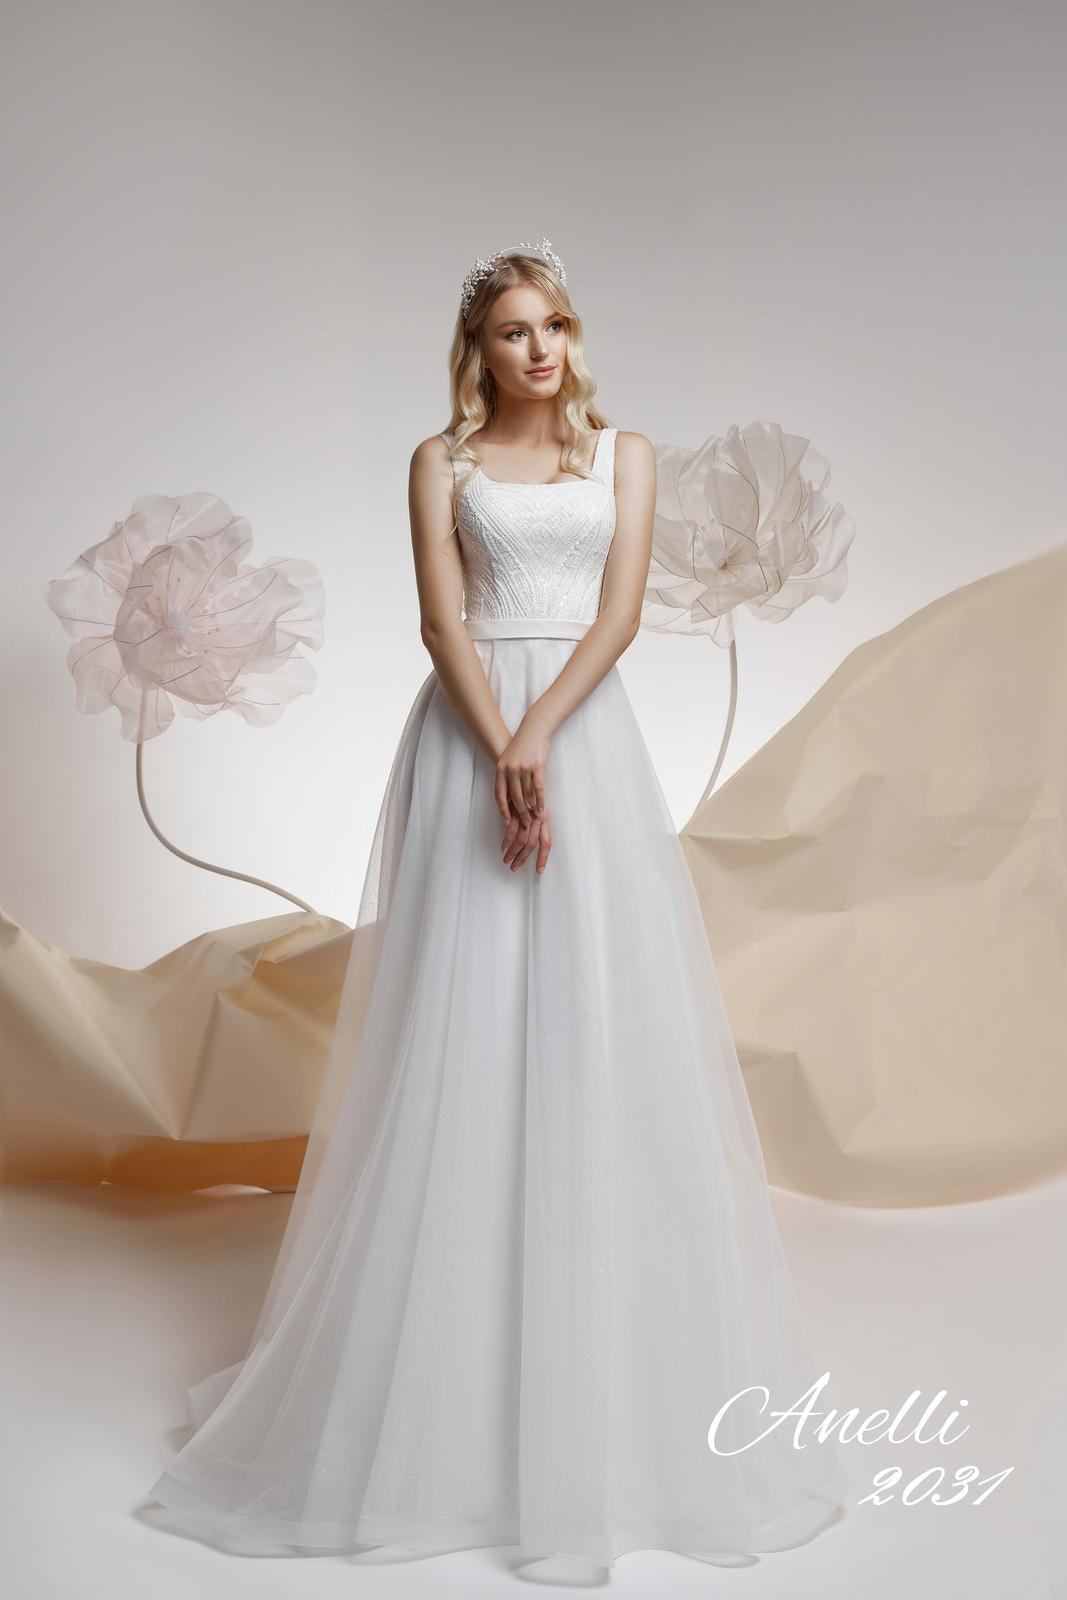 Svadobné šaty - Imagine 2031 - Obrázok č. 1